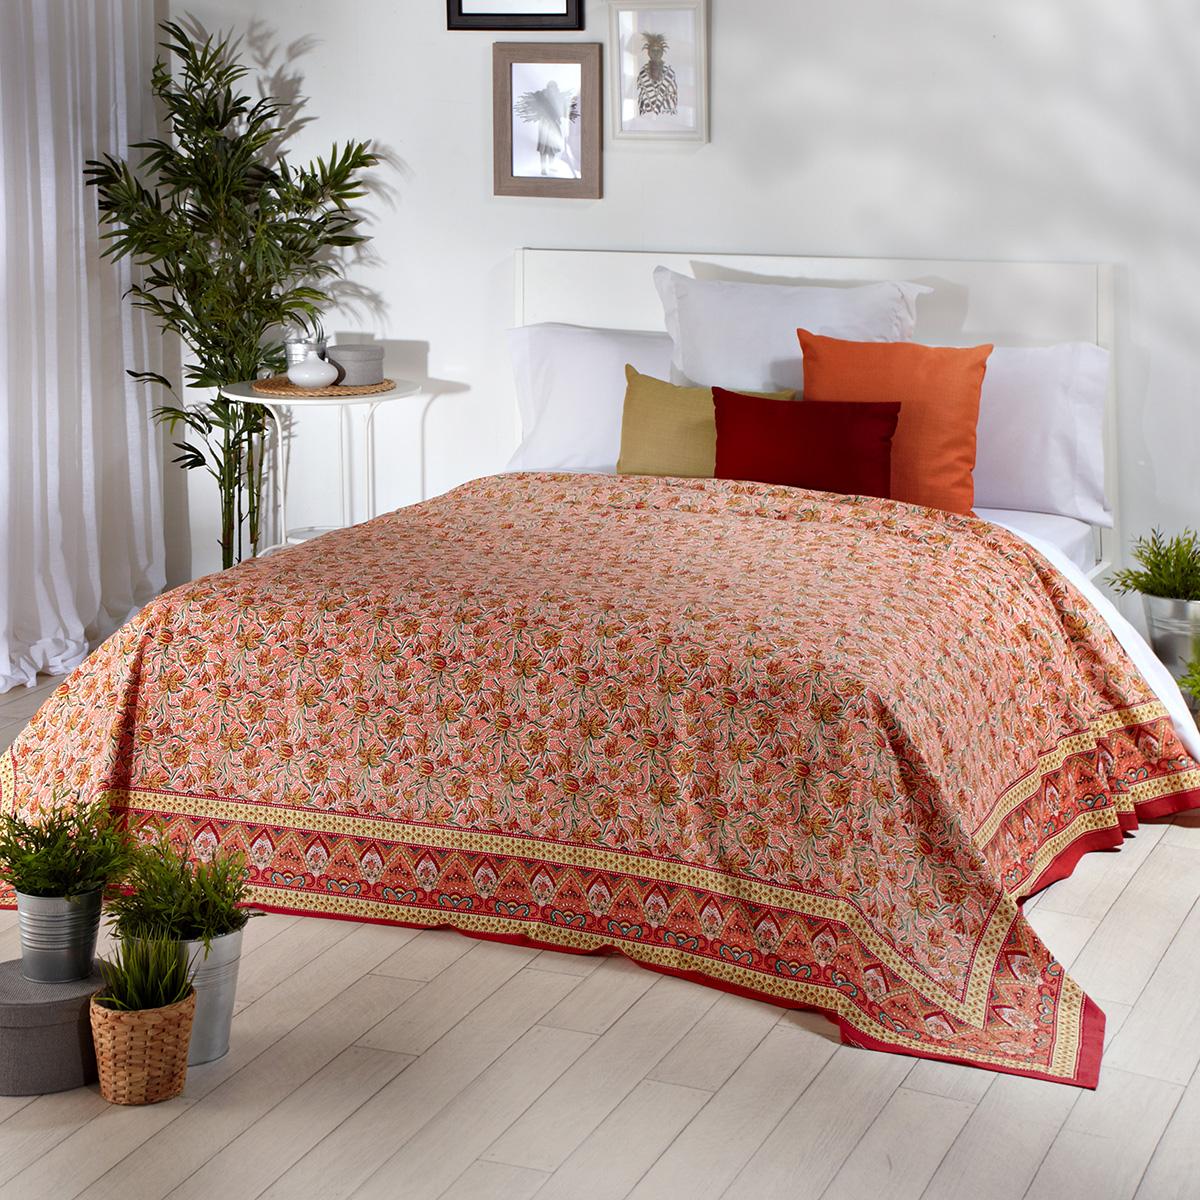 Foulard sofa Fmdf Prar Foulard Multiusos Estampado Naranja Barato Foulard